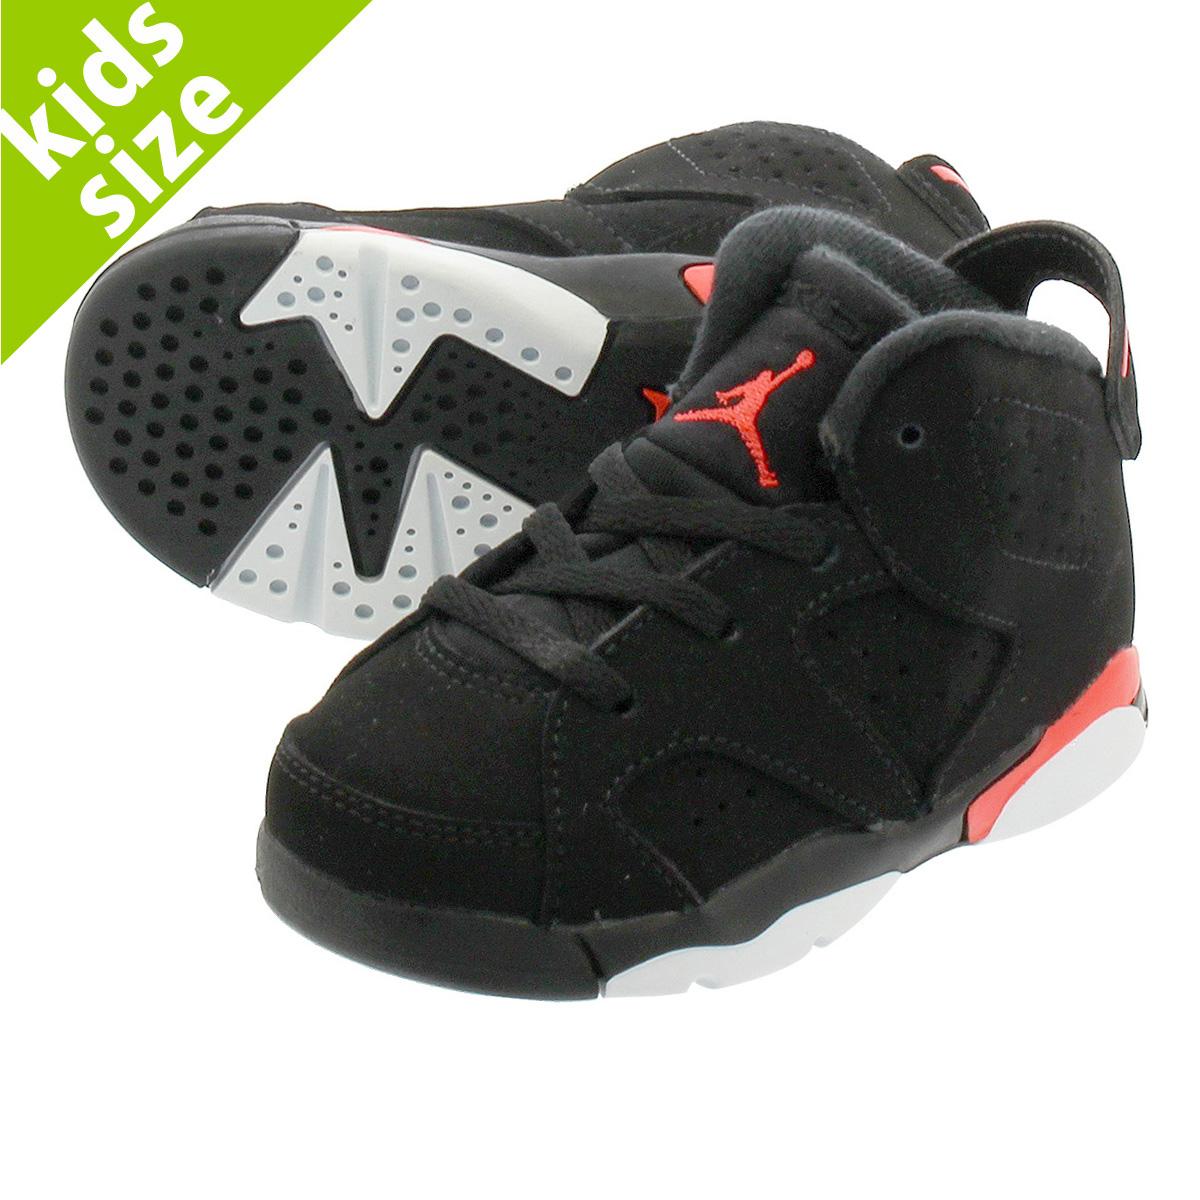 fd5f4cb93c7a NIKE AIR JORDAN 6 RETRO BT Nike Air Jordan 6 nostalgic BT BLACK INFRARED  384